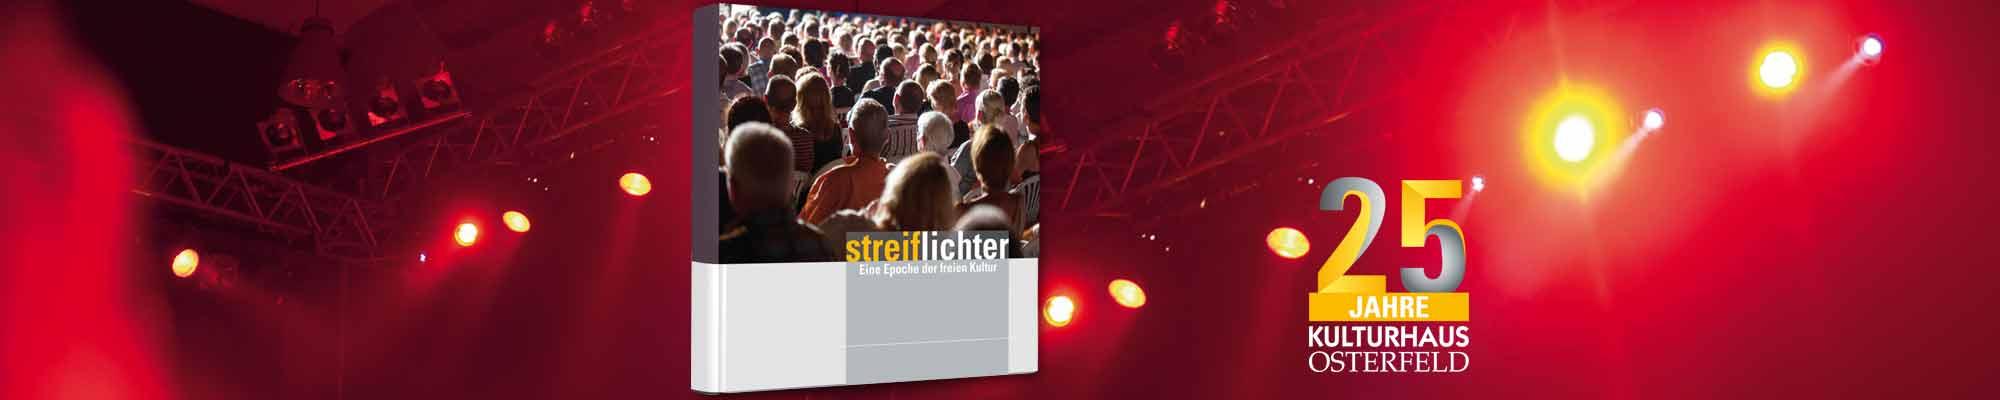 Festbuch Kulturhaus Osterfeld 25 Jahre Jubiläum